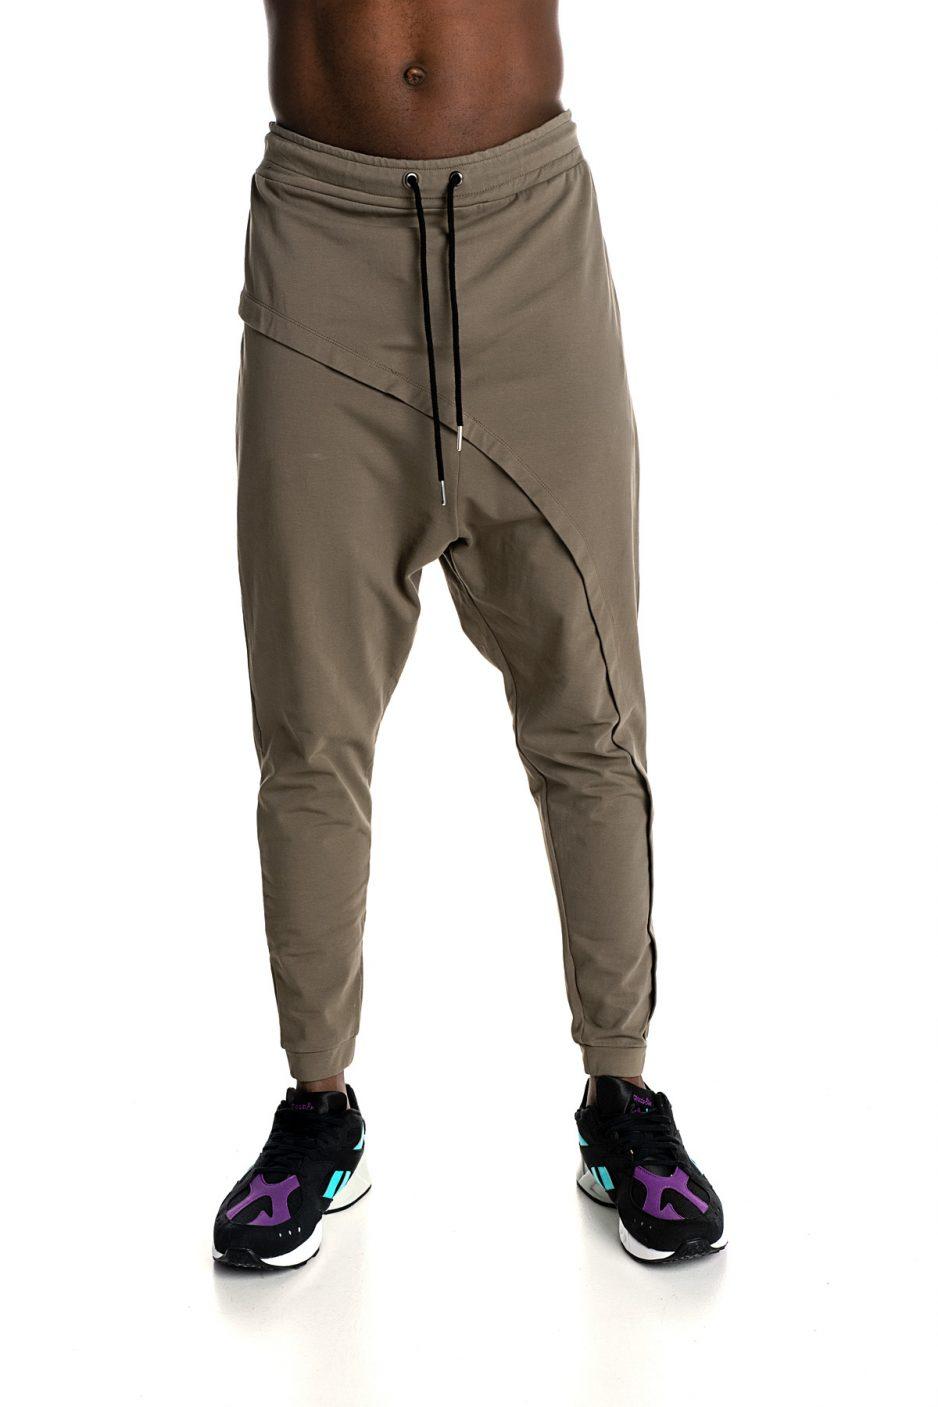 Khaki P/COC baggy trousers